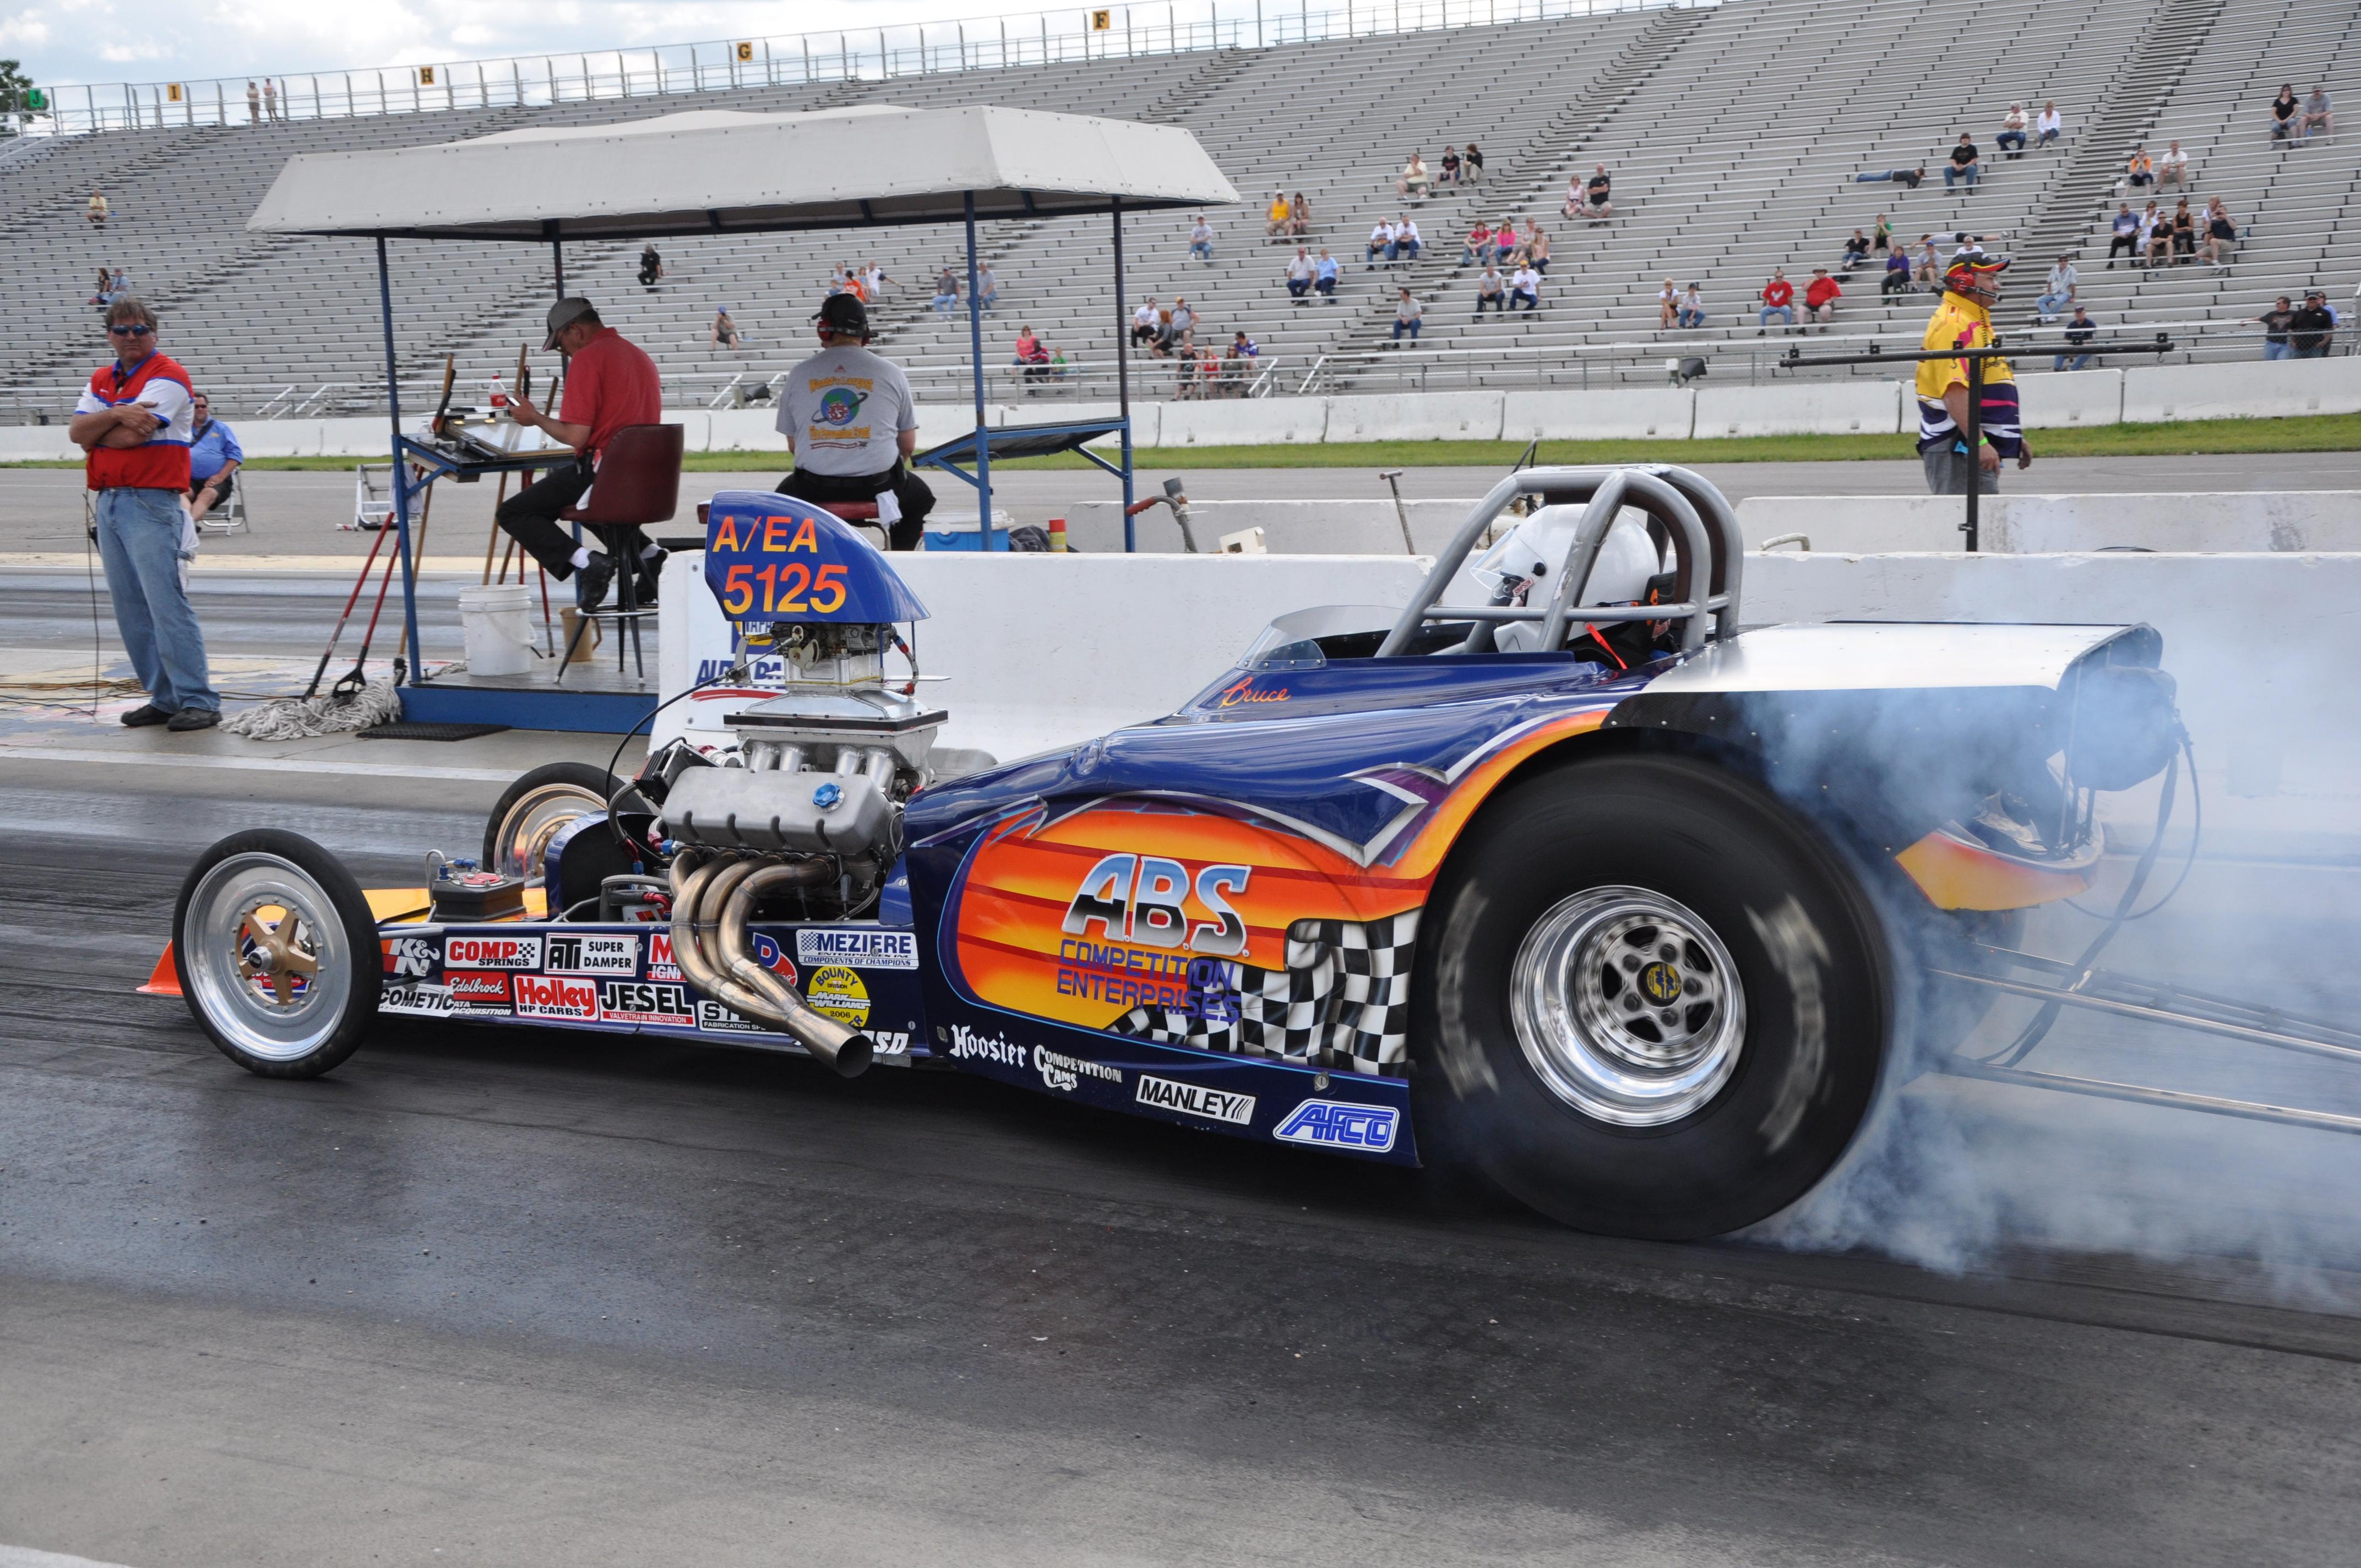 Hot Rod Rods Drag Race Racing Dragster Engine E Jpg